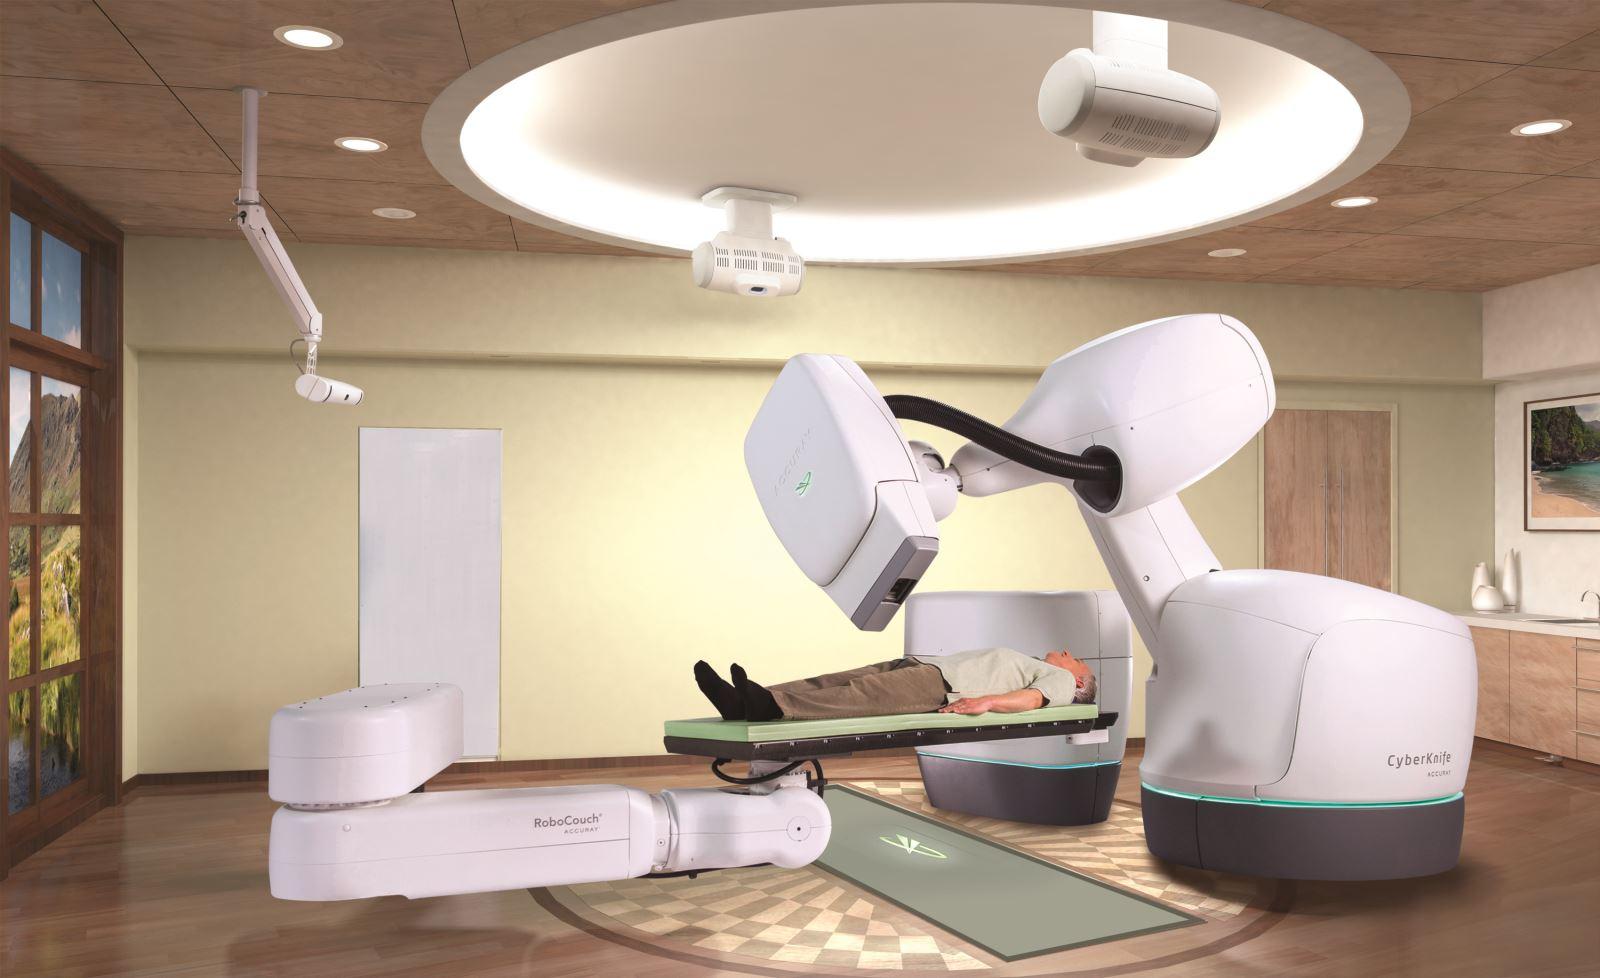 cyberknifeprostatecancer.jpg